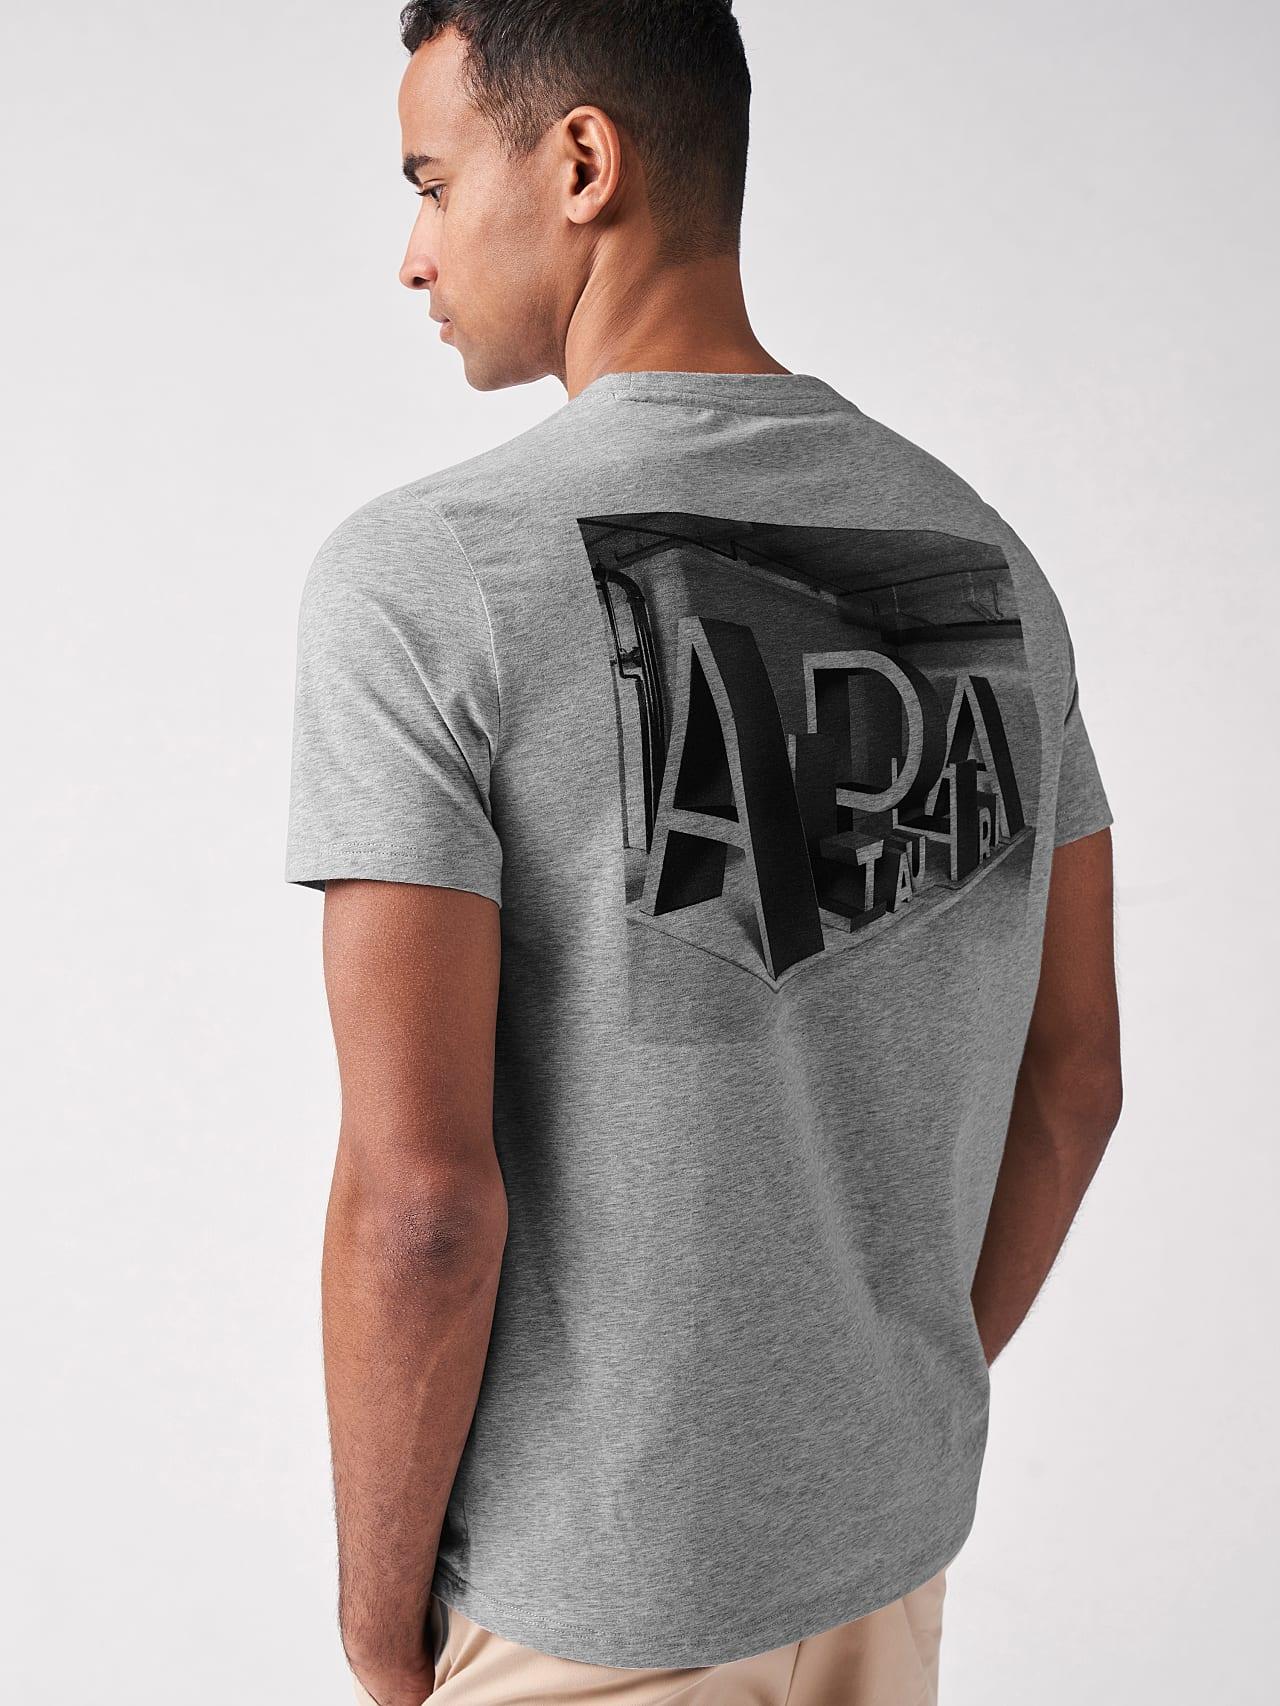 JALIP V1.Y5.01 Cotton Crew-Neck T-Shirt grey / melange Front Main Alpha Tauri